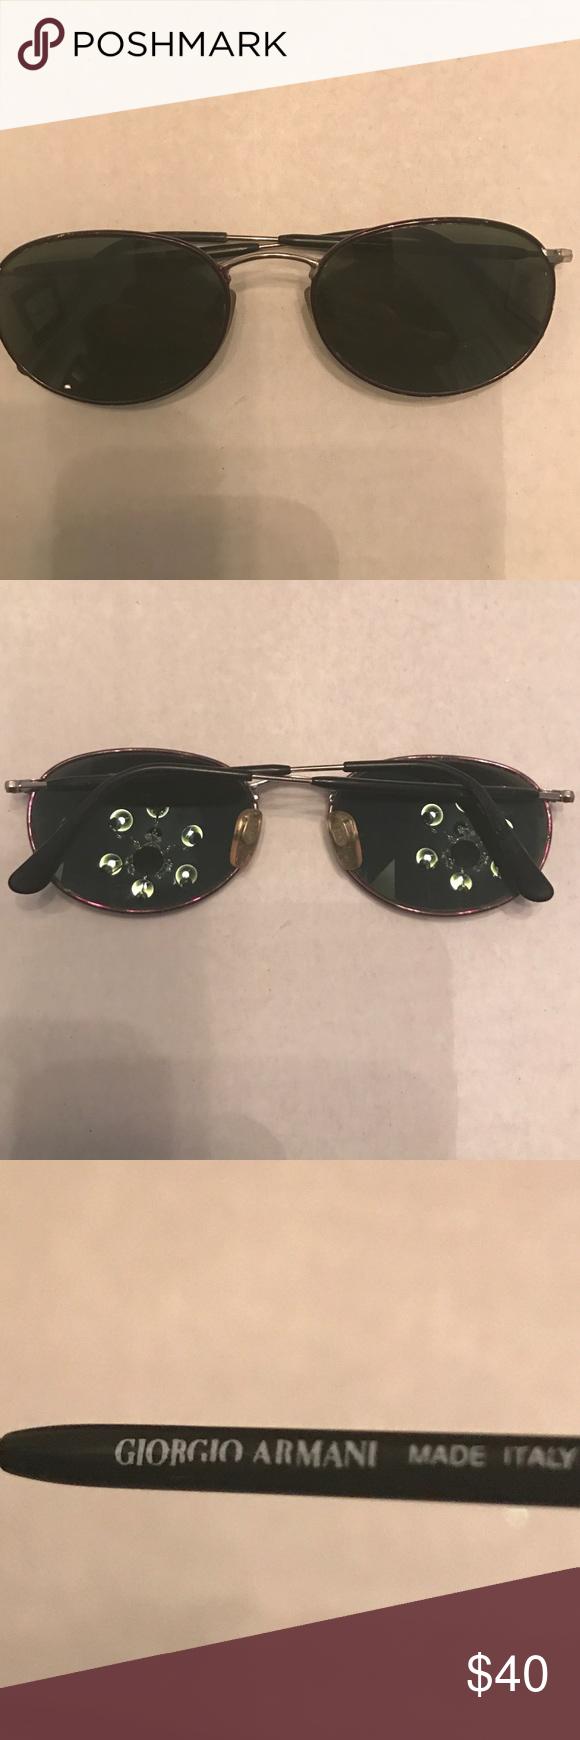 0dc982472e5a Georgia Armani sunglasses Sunglasses from the Georgia Armani frames of life  collection. Good used condition. With case Giorgio Armani Accessories  Glasses